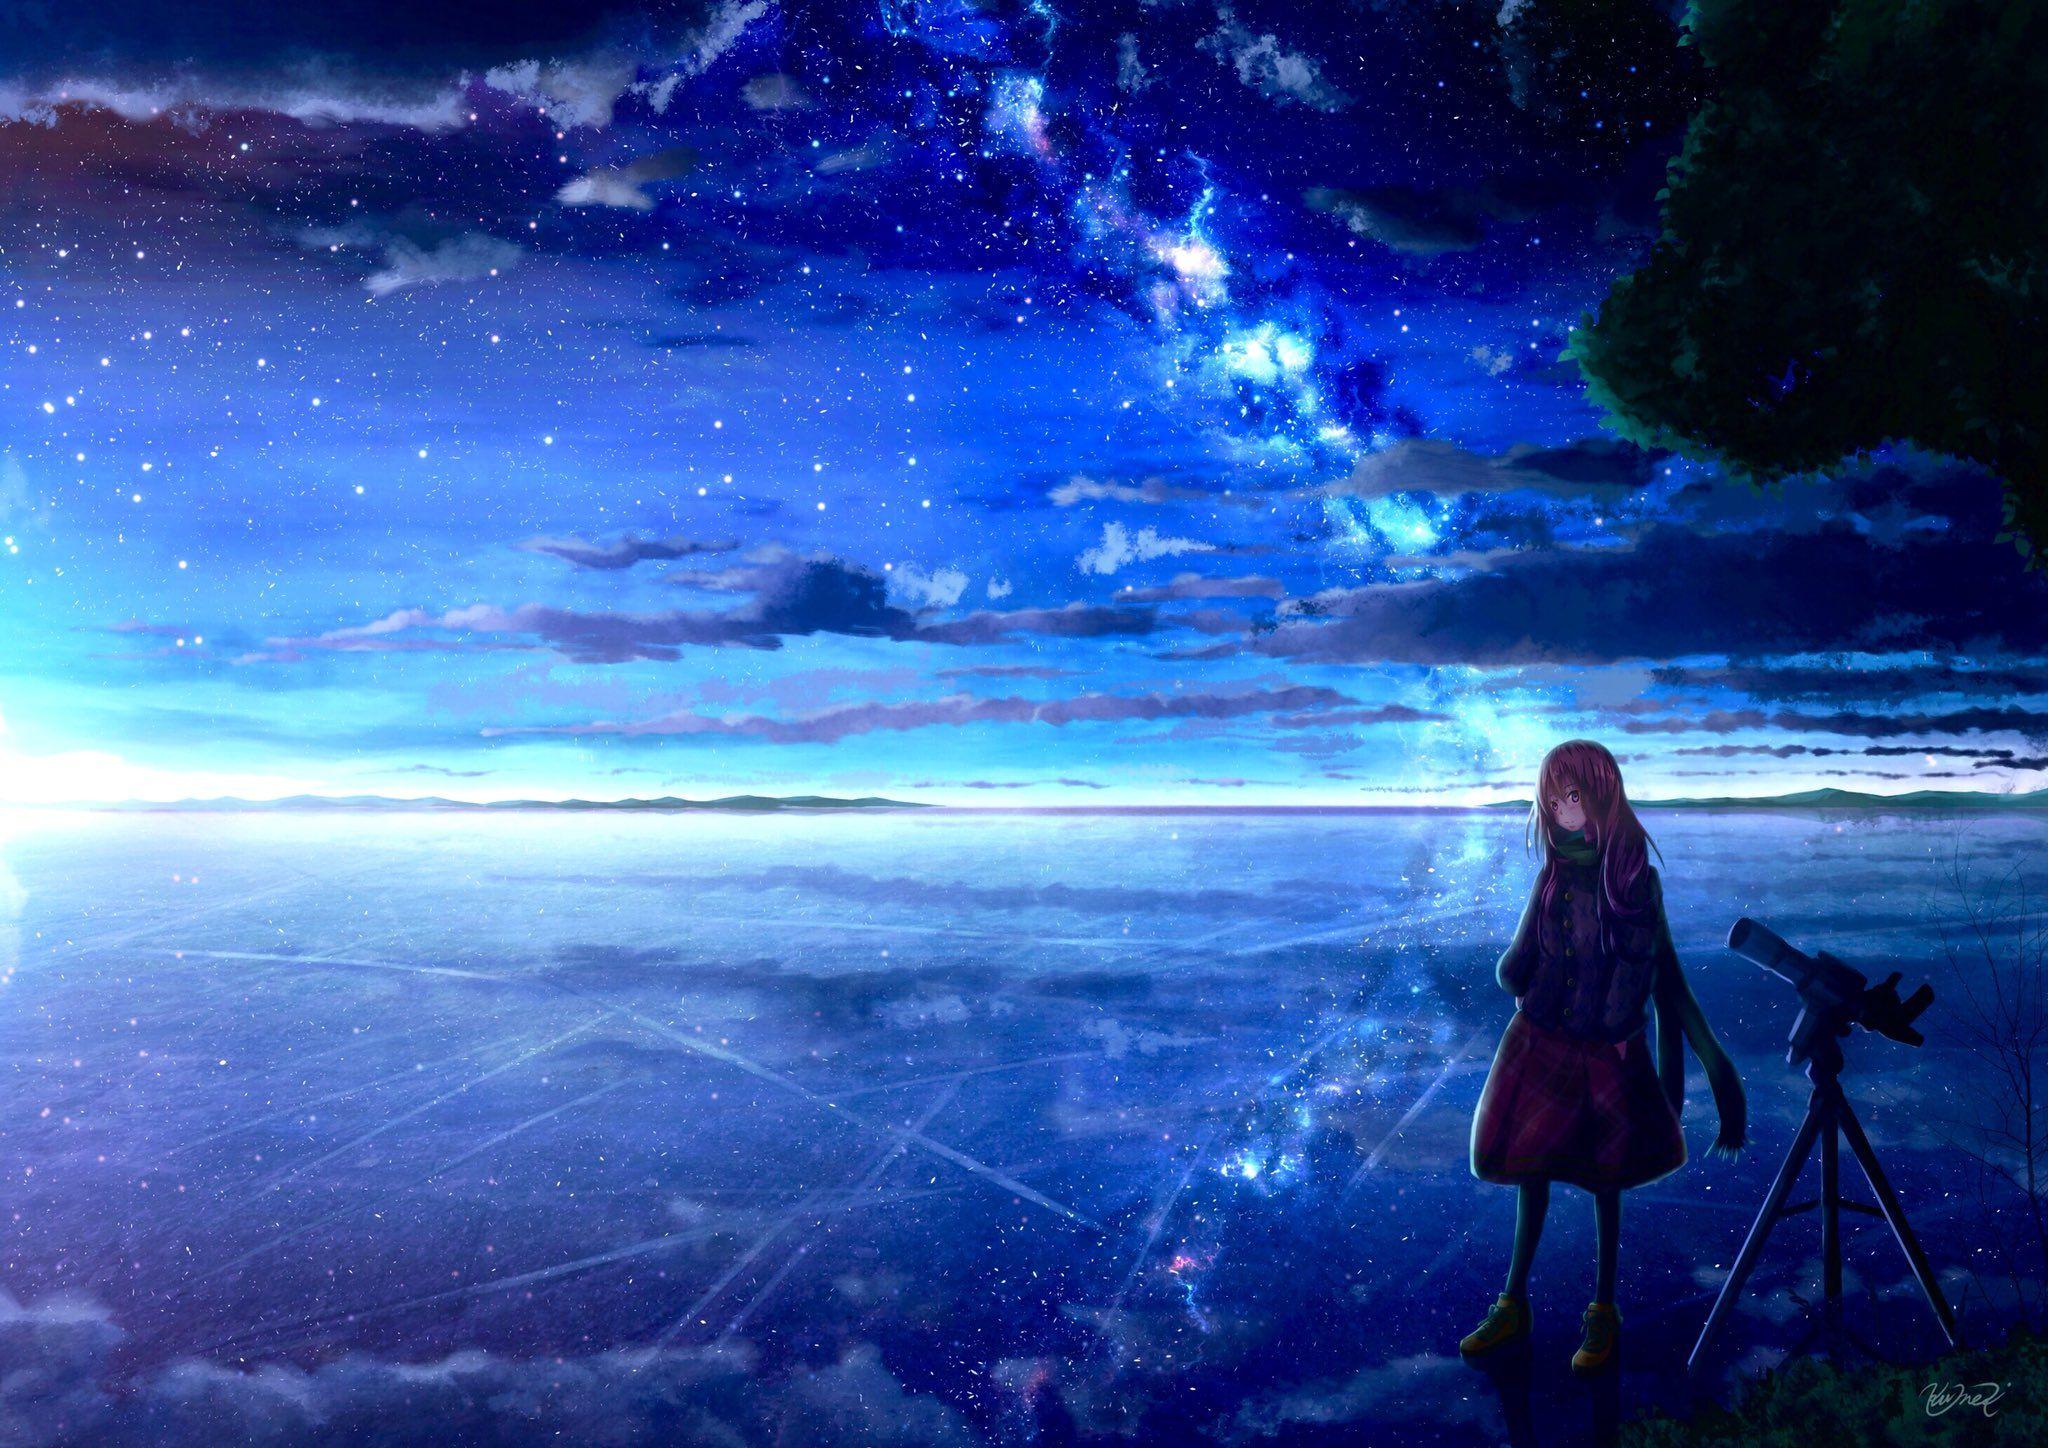 Pin By Jeni On Paisajes Anime Anime Scenery Anime Scenery Wallpaper Anime Background